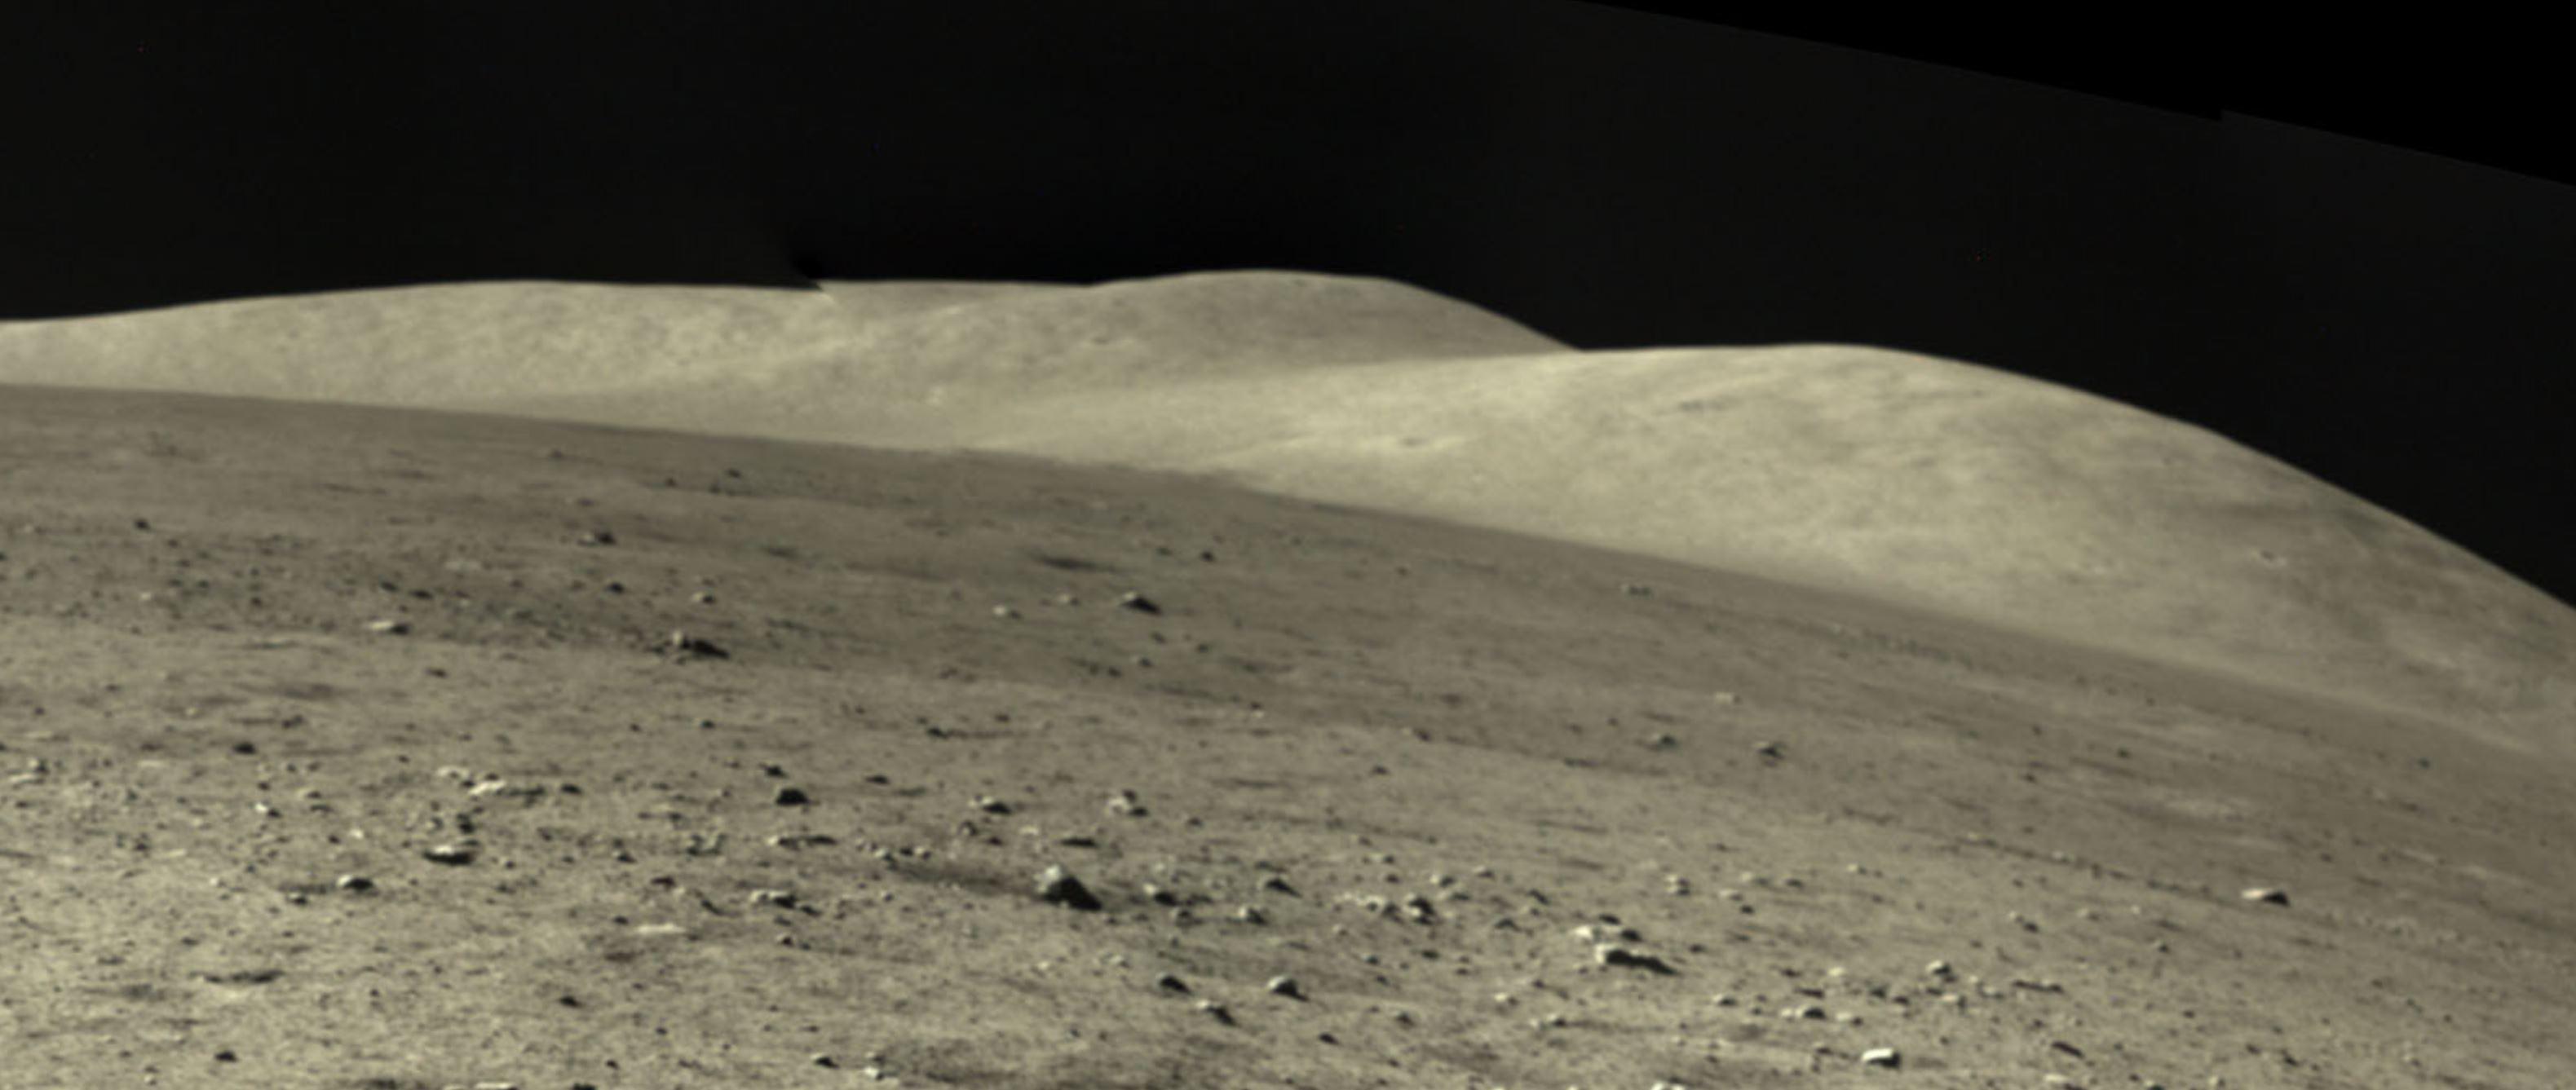 2020-surface-photo-moon.jpg